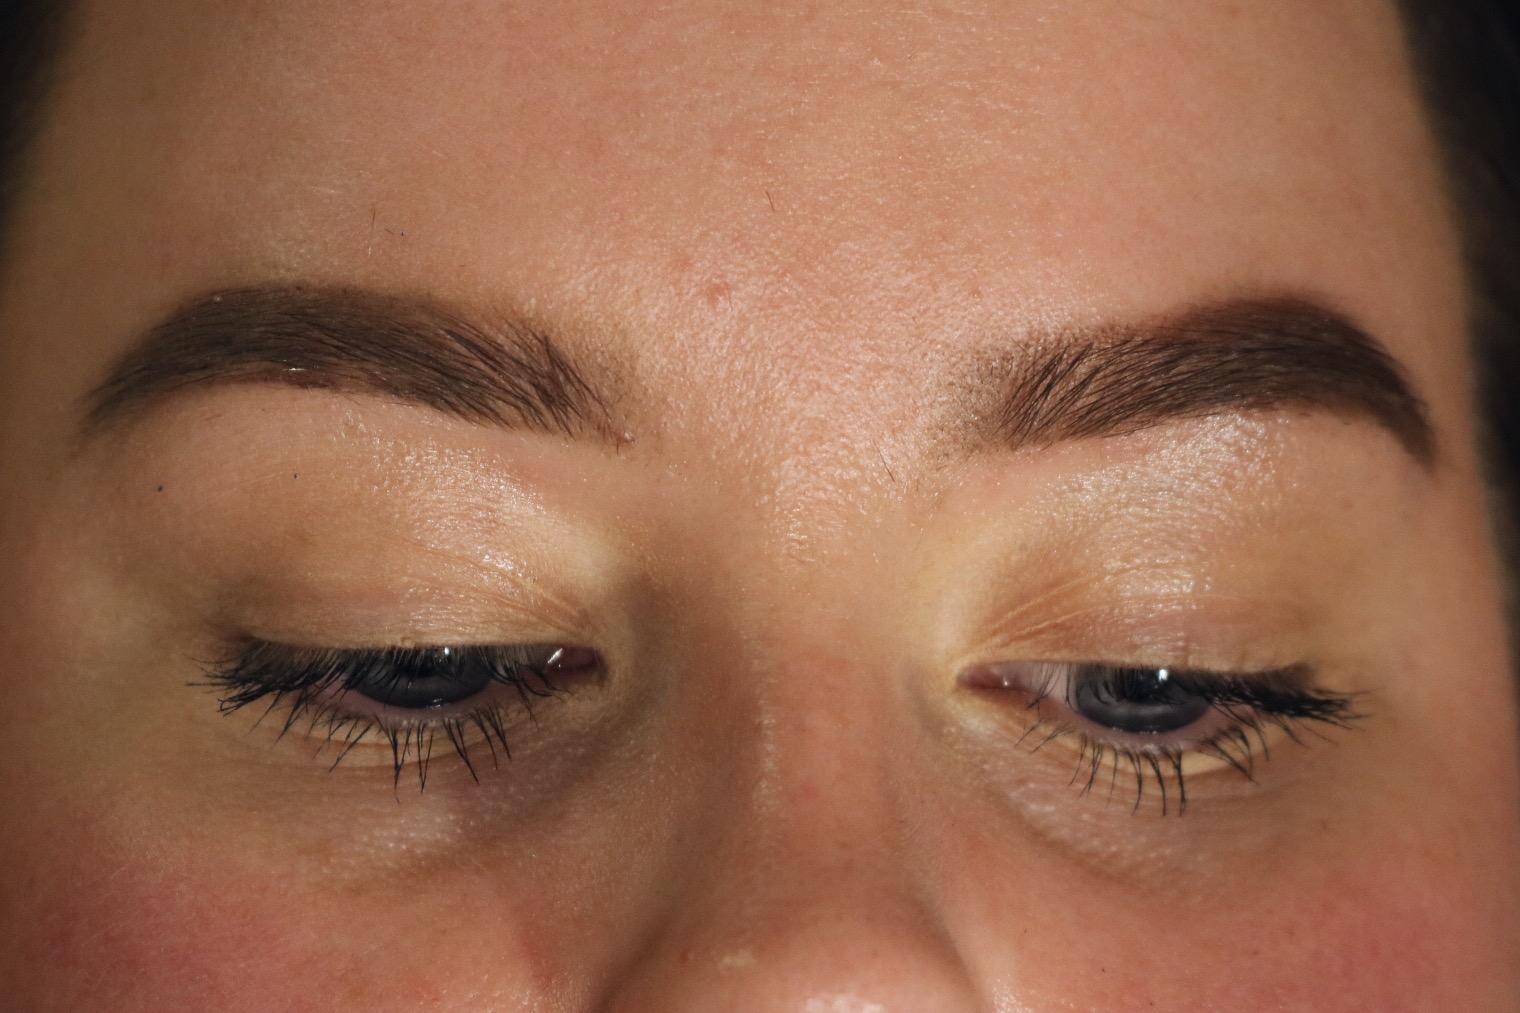 Daisy Beauty London 2016 Dag 1 Brow Gal och Apoliva, nyheter, amandahans, skönhetsblogg, skönhetsbloggare apoliva nyheter makeuptrender smink 2017 daisybeautylondon2016, tonya crooks The brow Gal